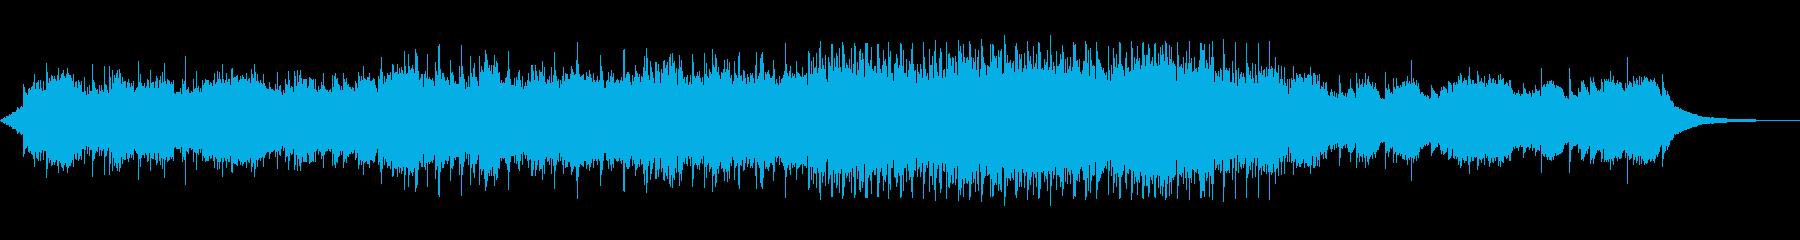 bpm84悲し気なピアノ+アコギ+テクノの再生済みの波形